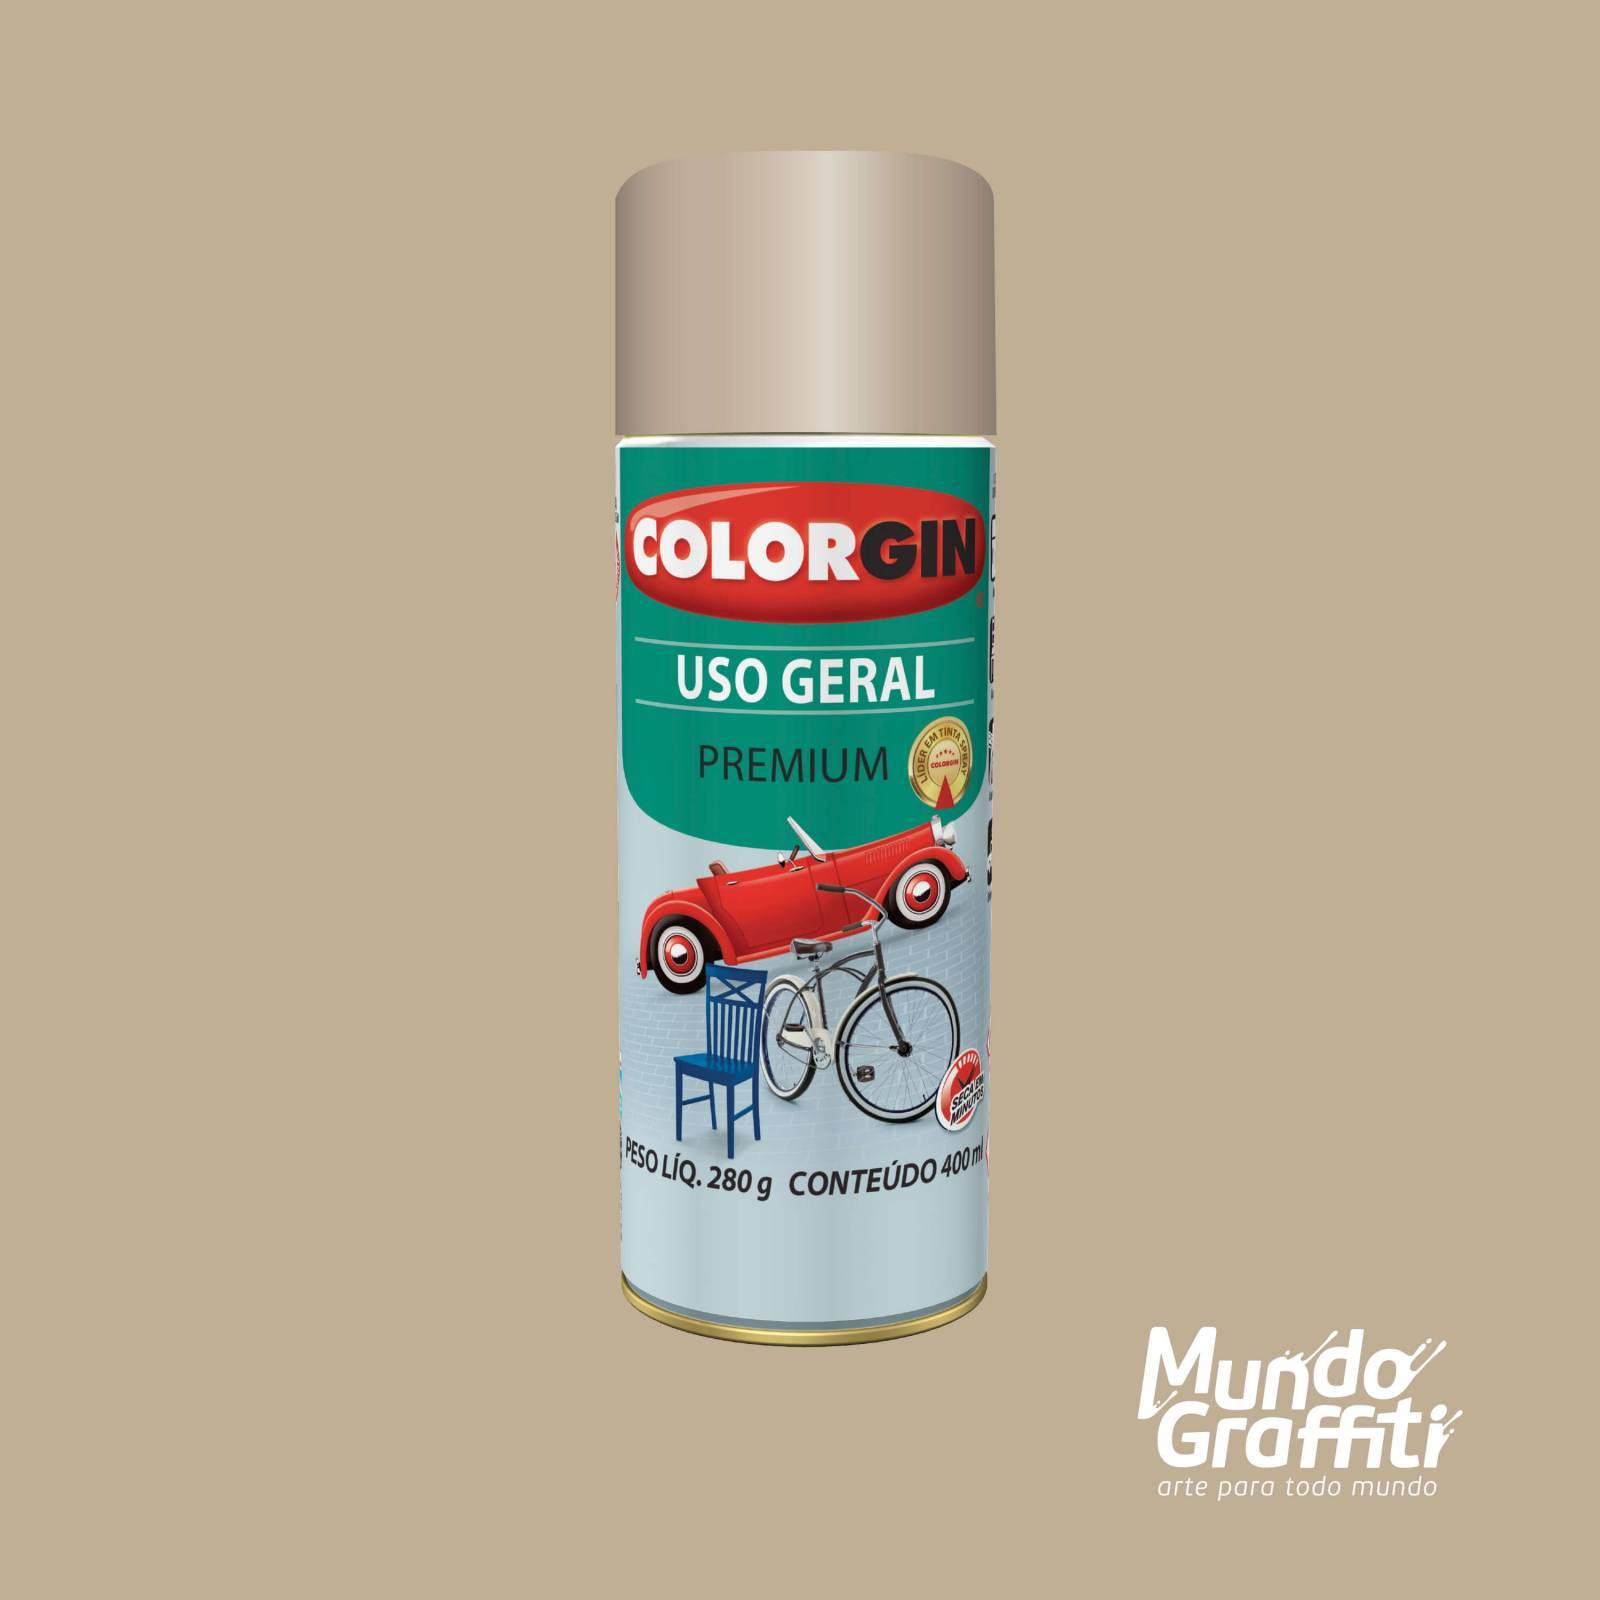 Tinta Spray Colorgin Uso Geral 55241 Bege Brastemp 400ml - Mundo Graffiti